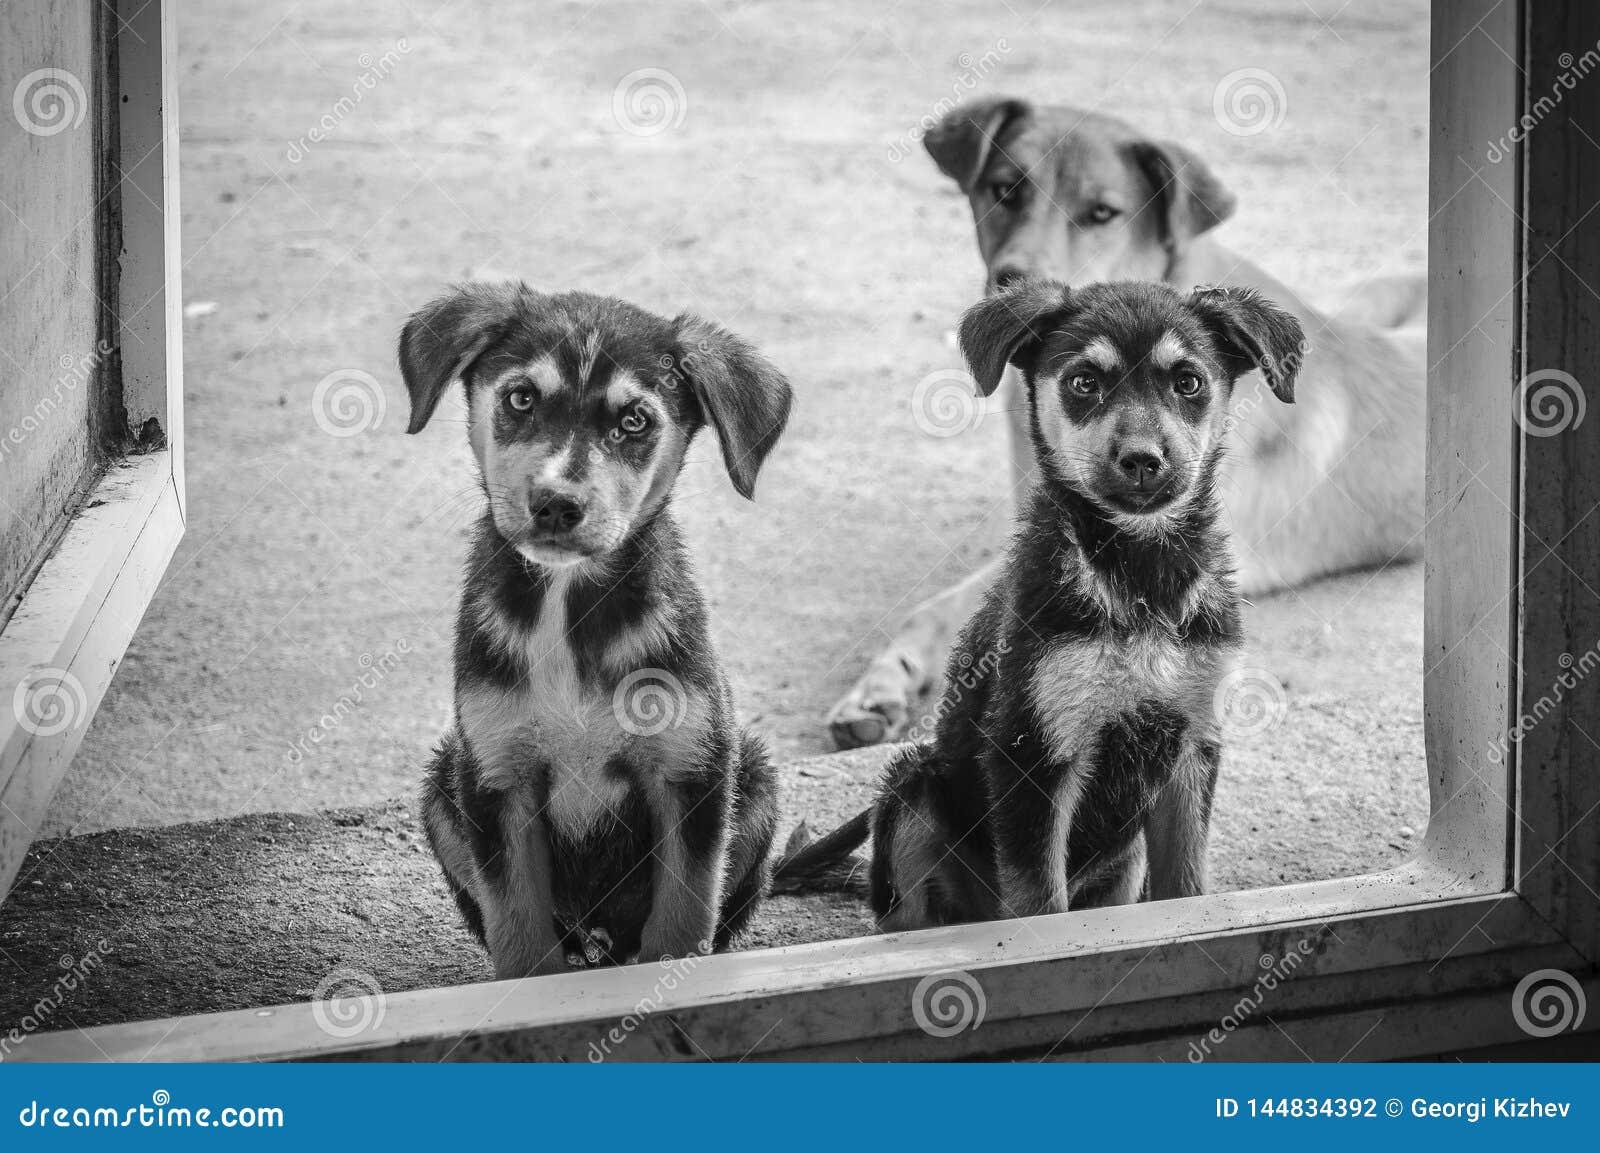 Best friend-three dogs